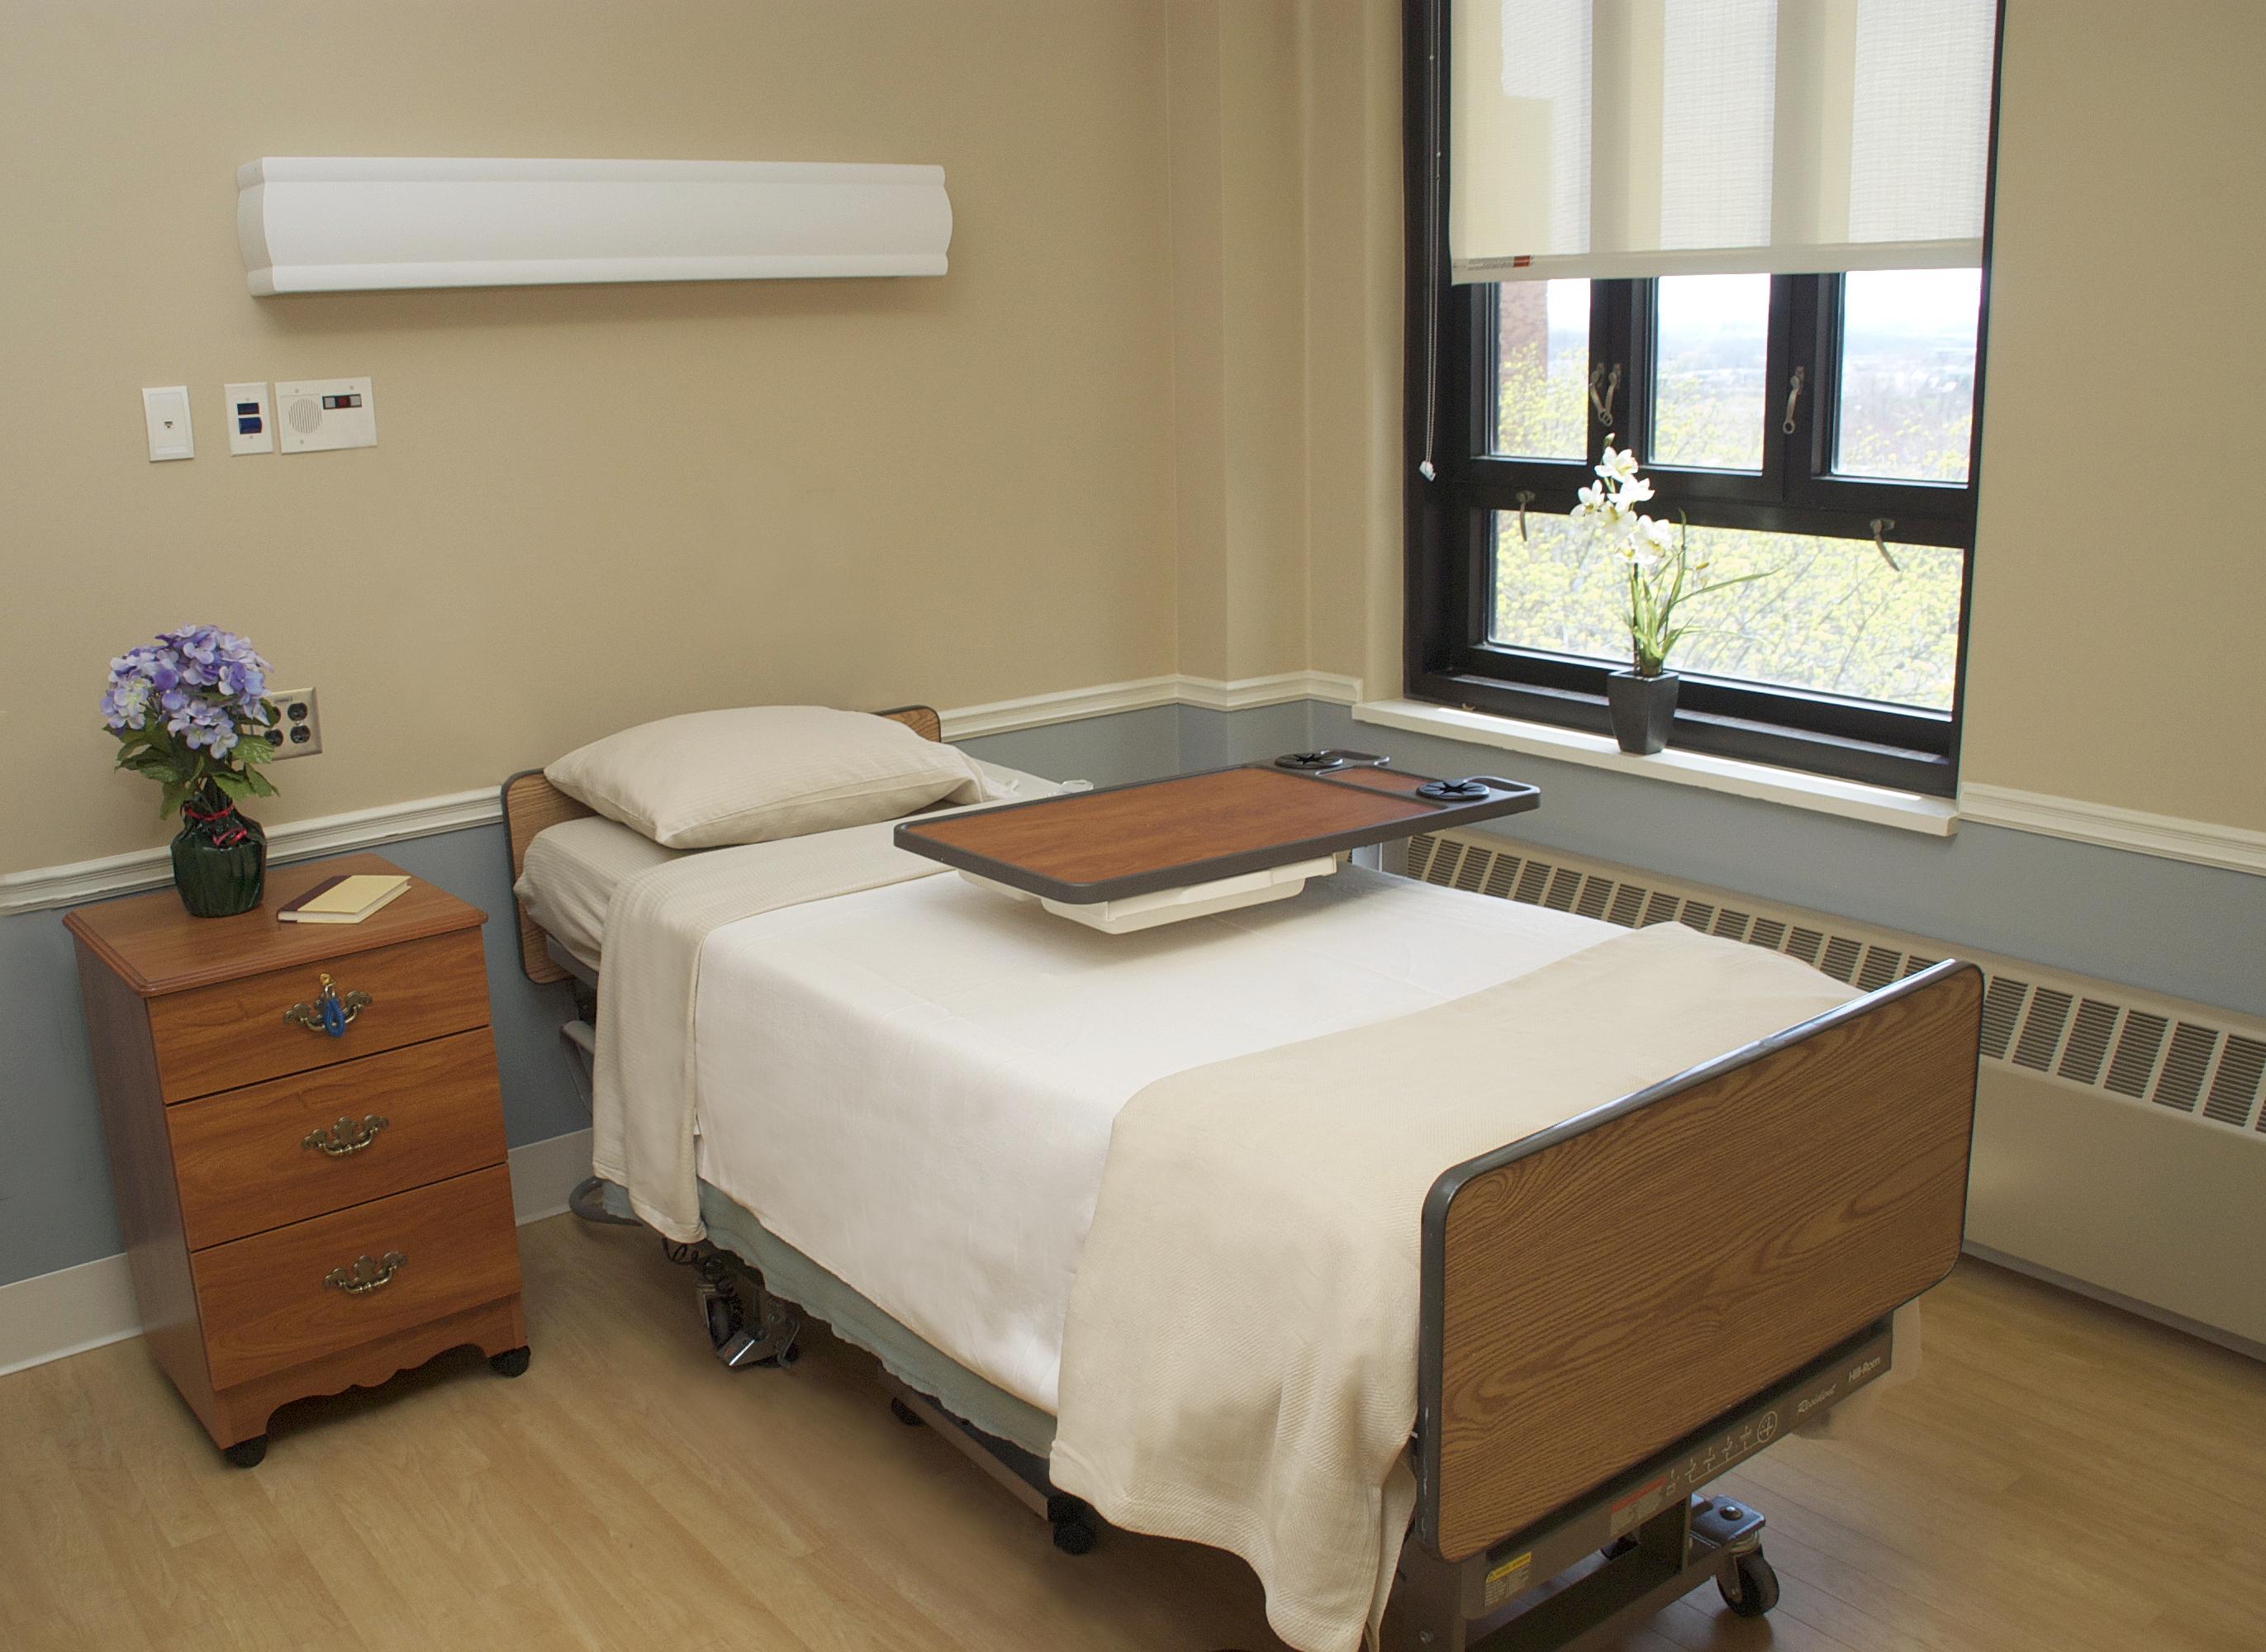 rehab_room (1)